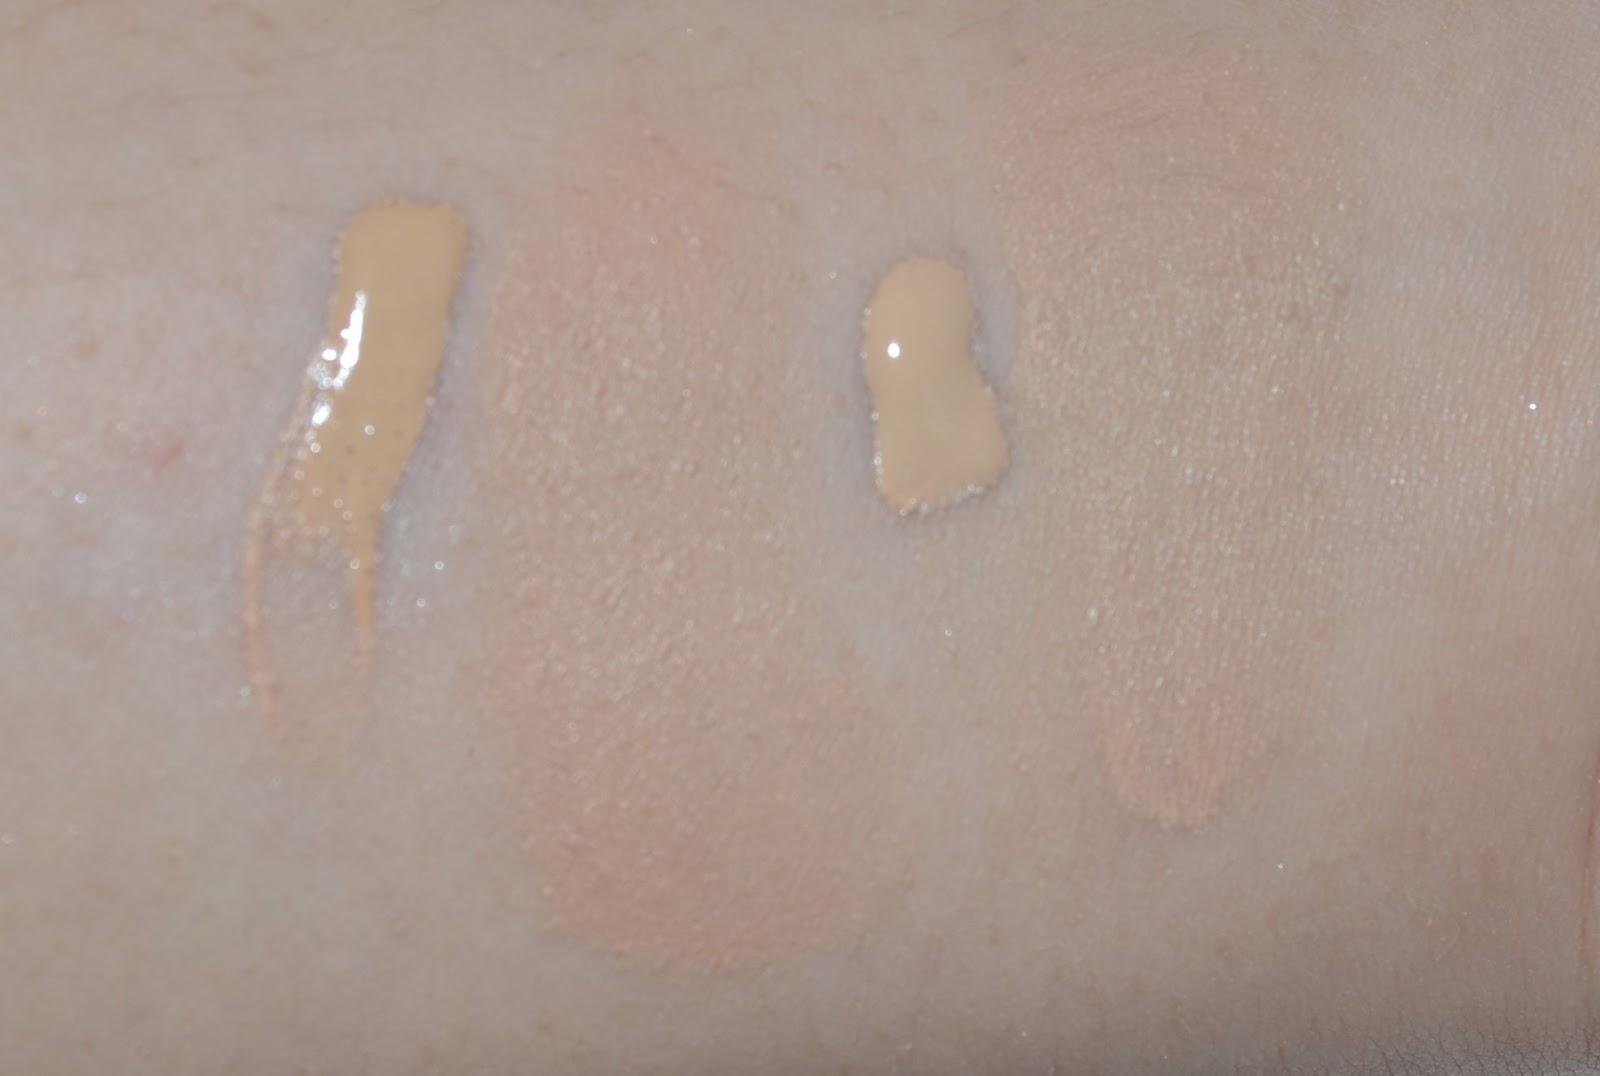 Simply Dianas Makeup Chronicles Chanel Vitalumiere Aqua 20 Beige Vitalumire Ultra Light Skin Perfecting Spf 15 Leftvitalumiere Blended Right Perfection Lumiere Velvet